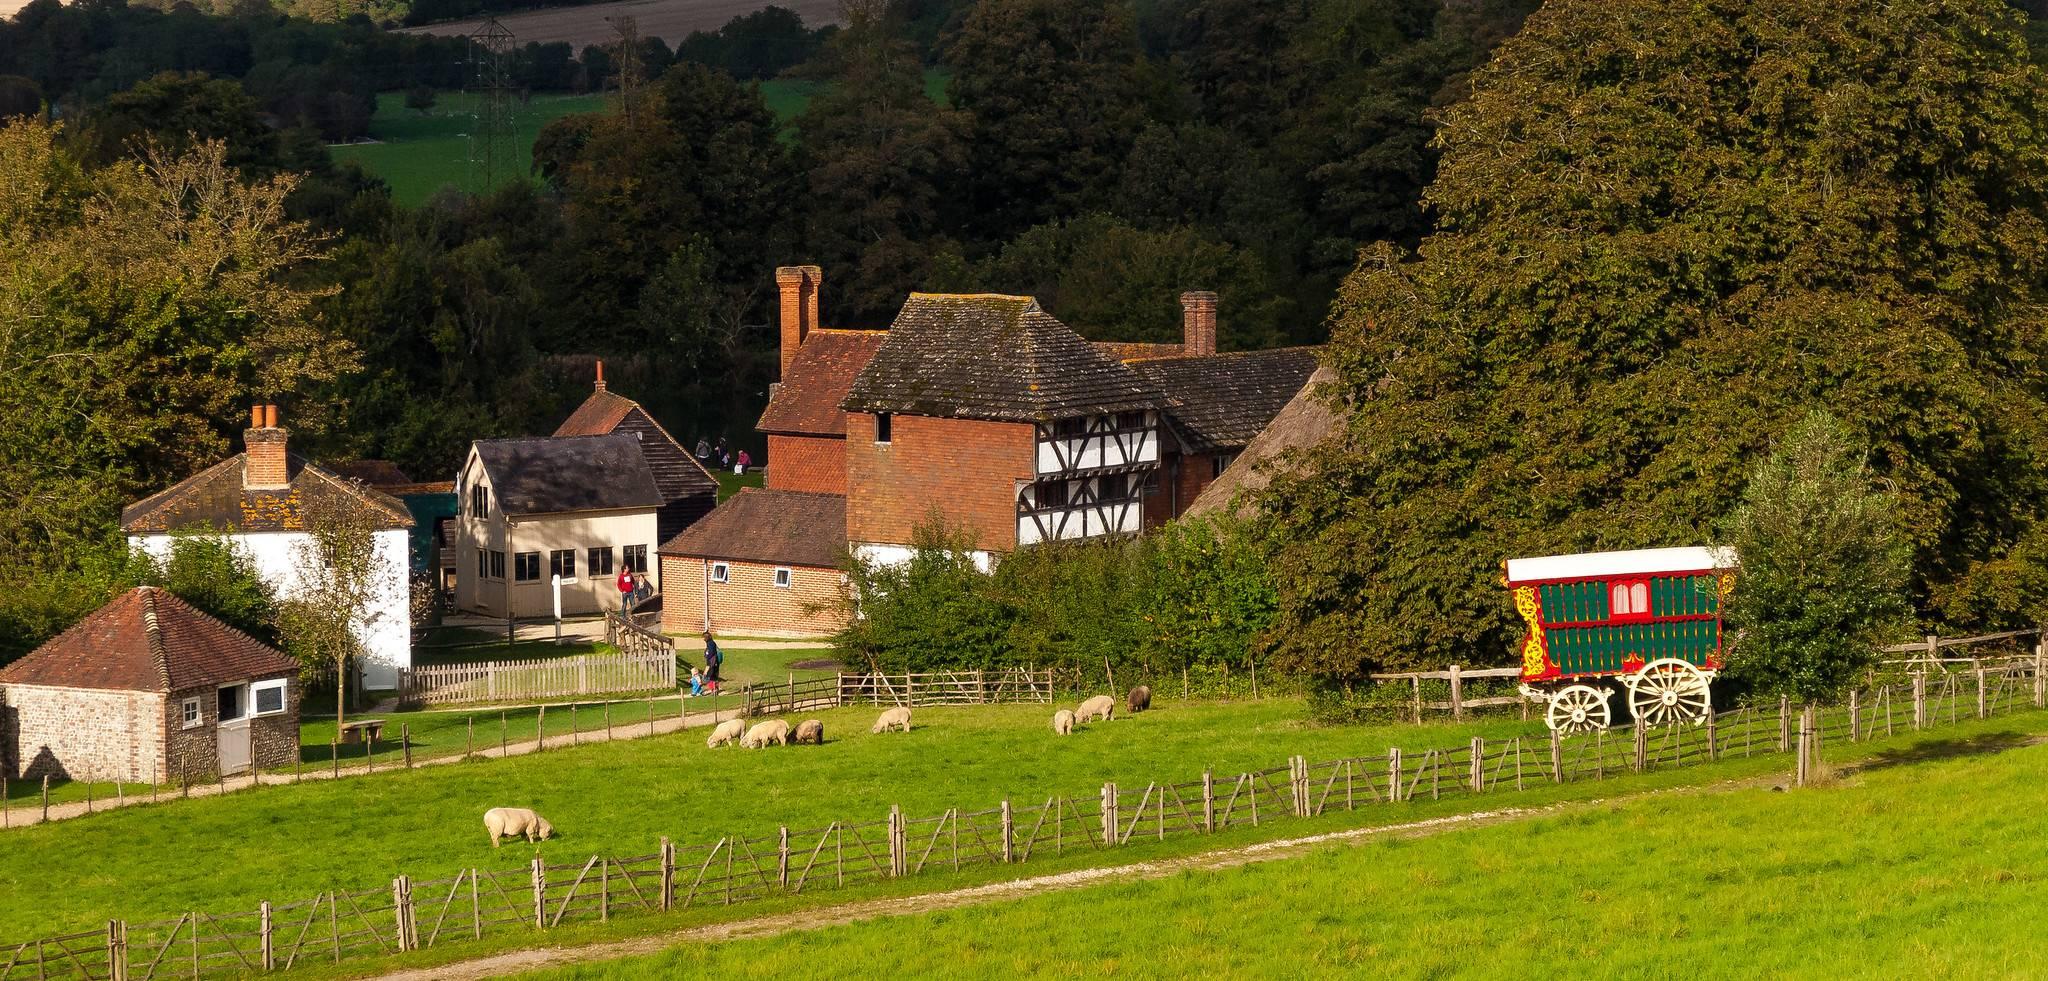 Weald and Downland Living Museum: Museo que colecciona casas